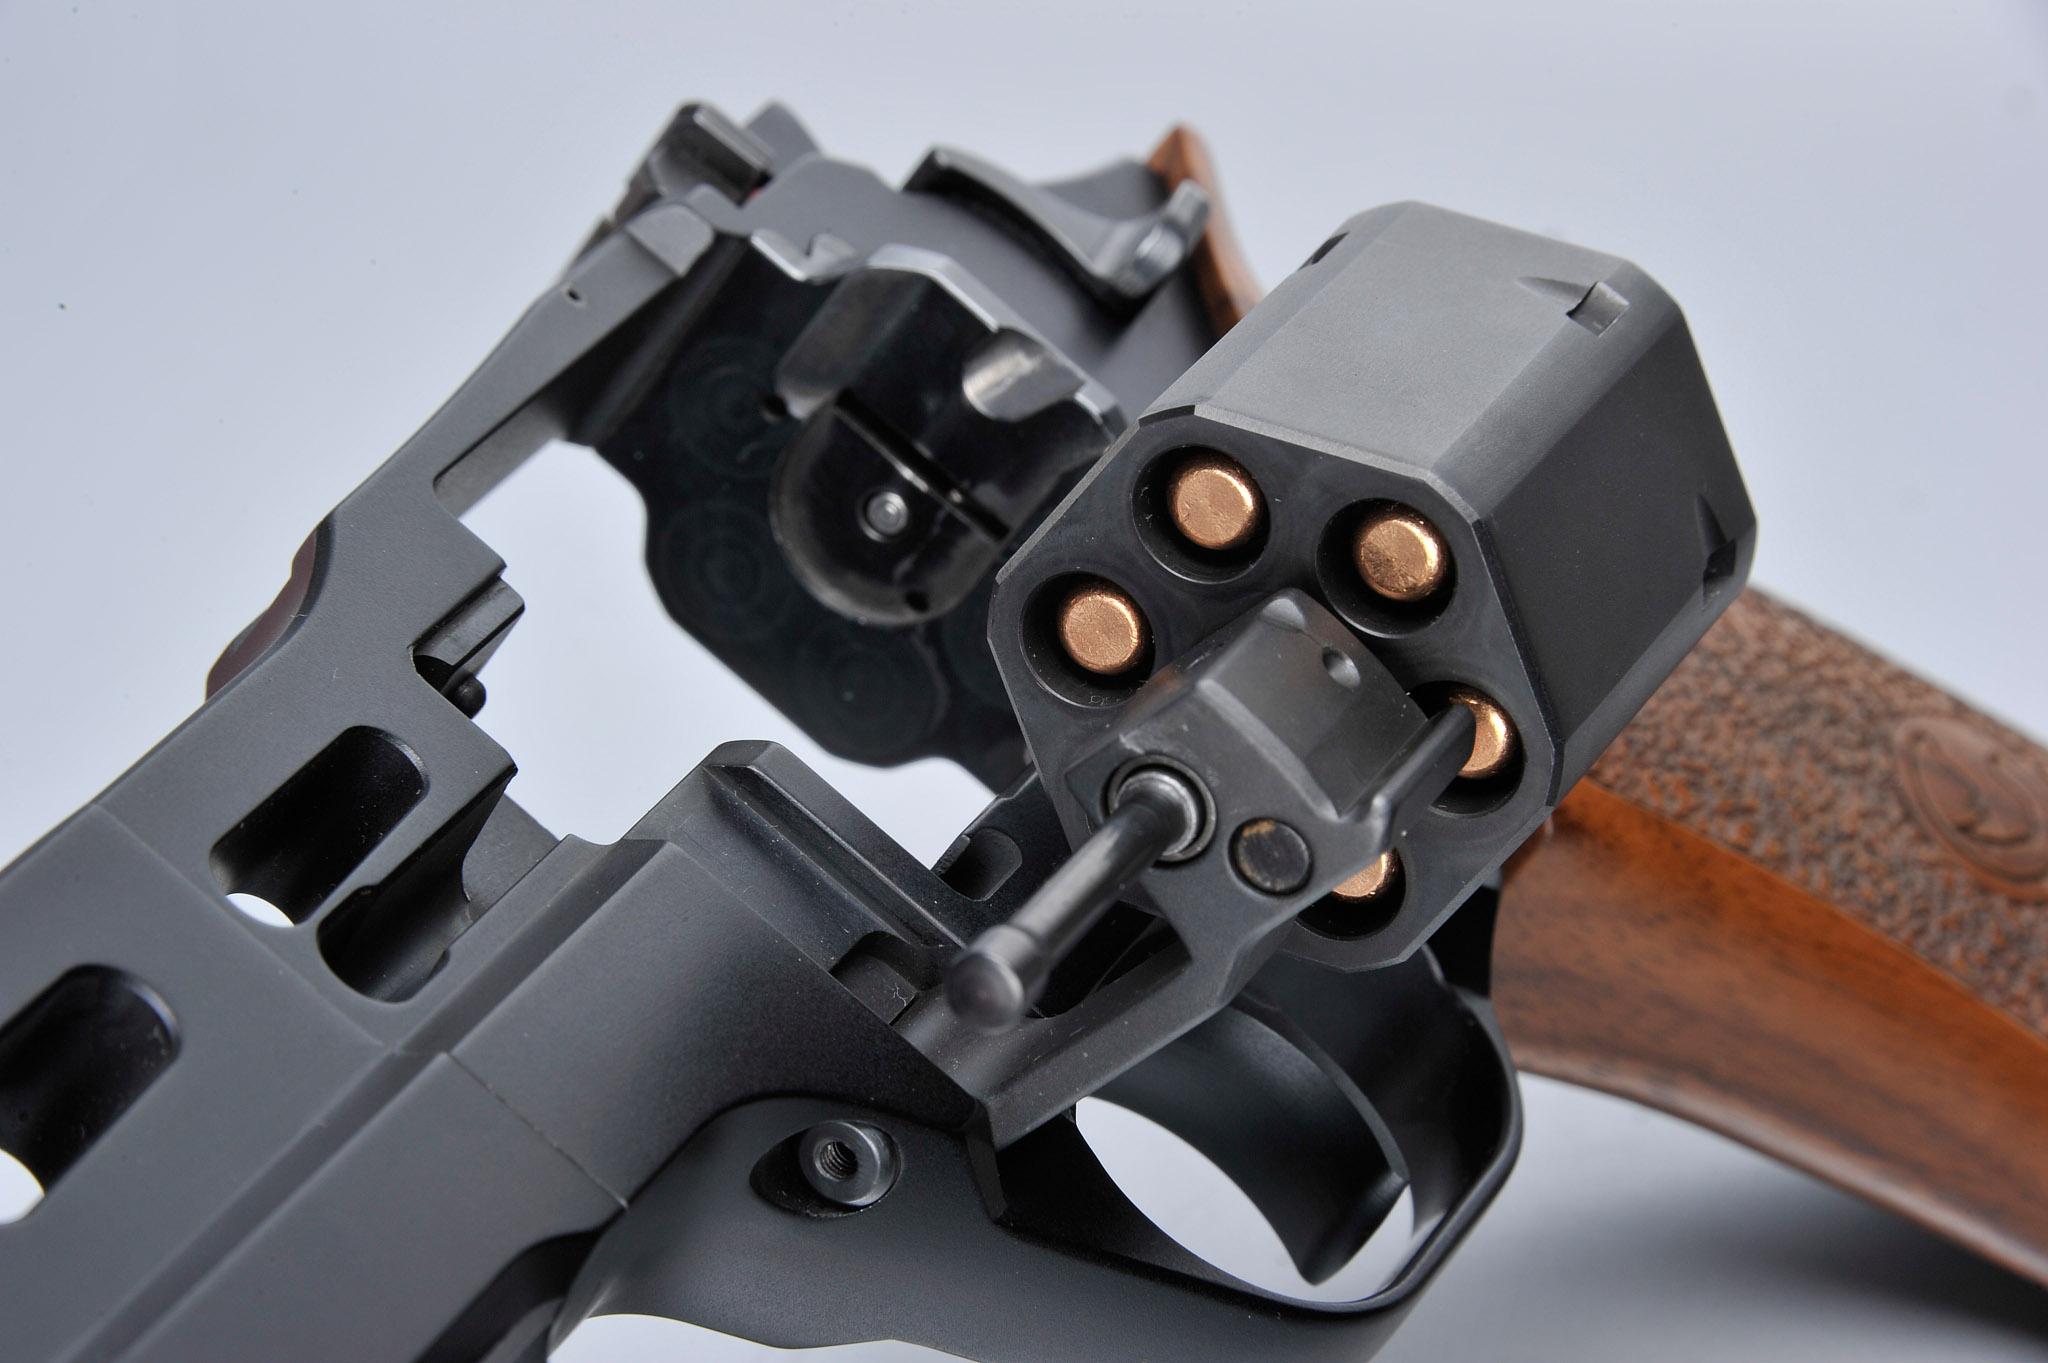 Chiappa-Rhino-357-cylinder-closing-pin.jpg?resize=248x